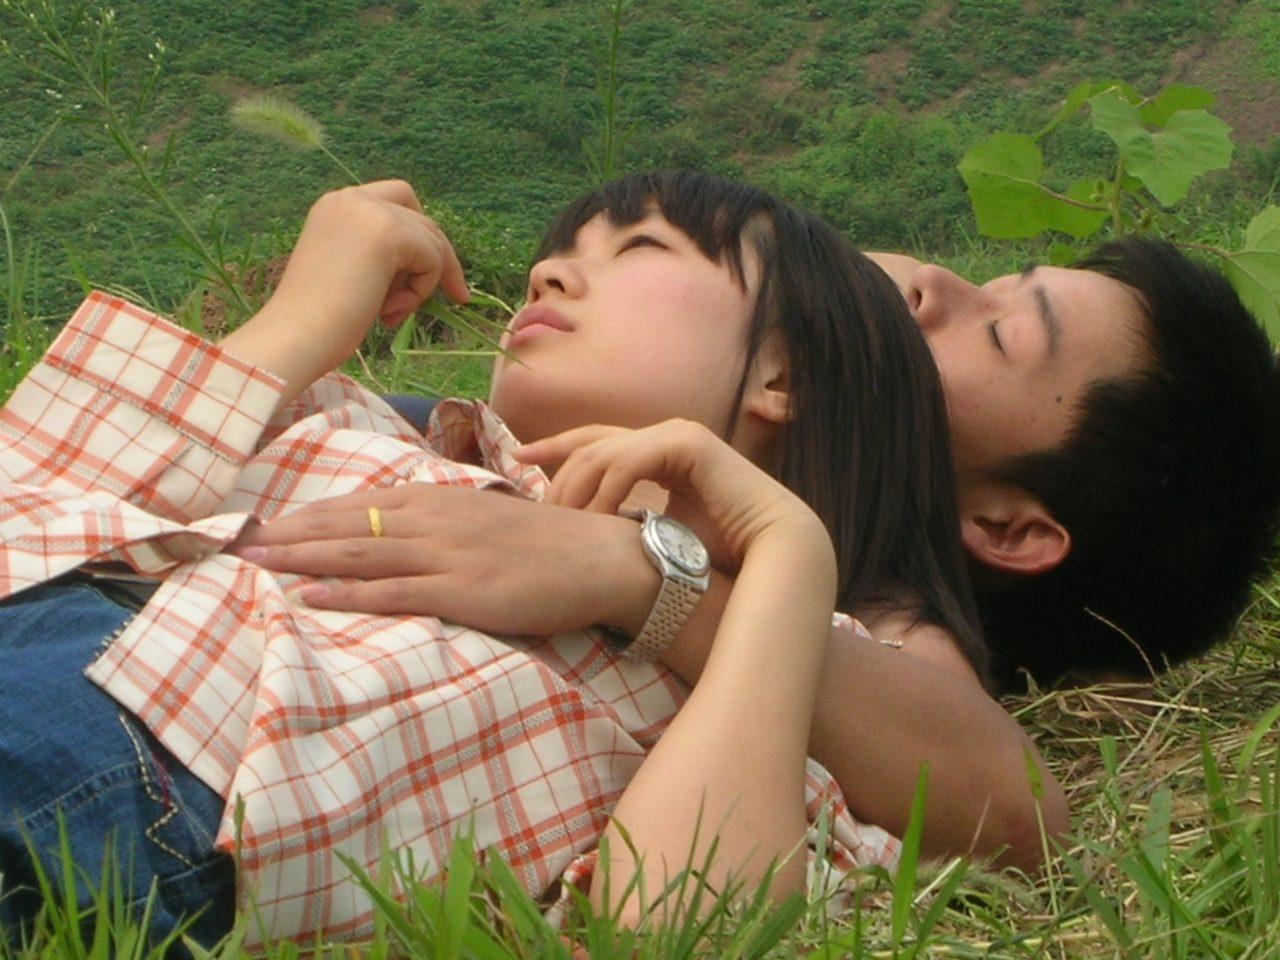 Ella, una joven china, Xiaolu Guo. 19:00